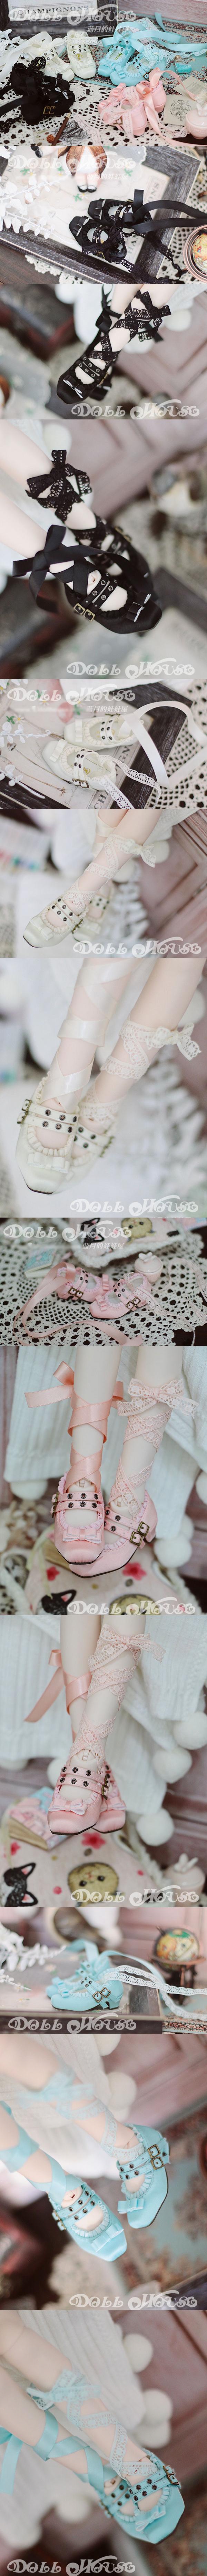 1/4 Girl Pink/Blue/White/Black Ballet Shoes